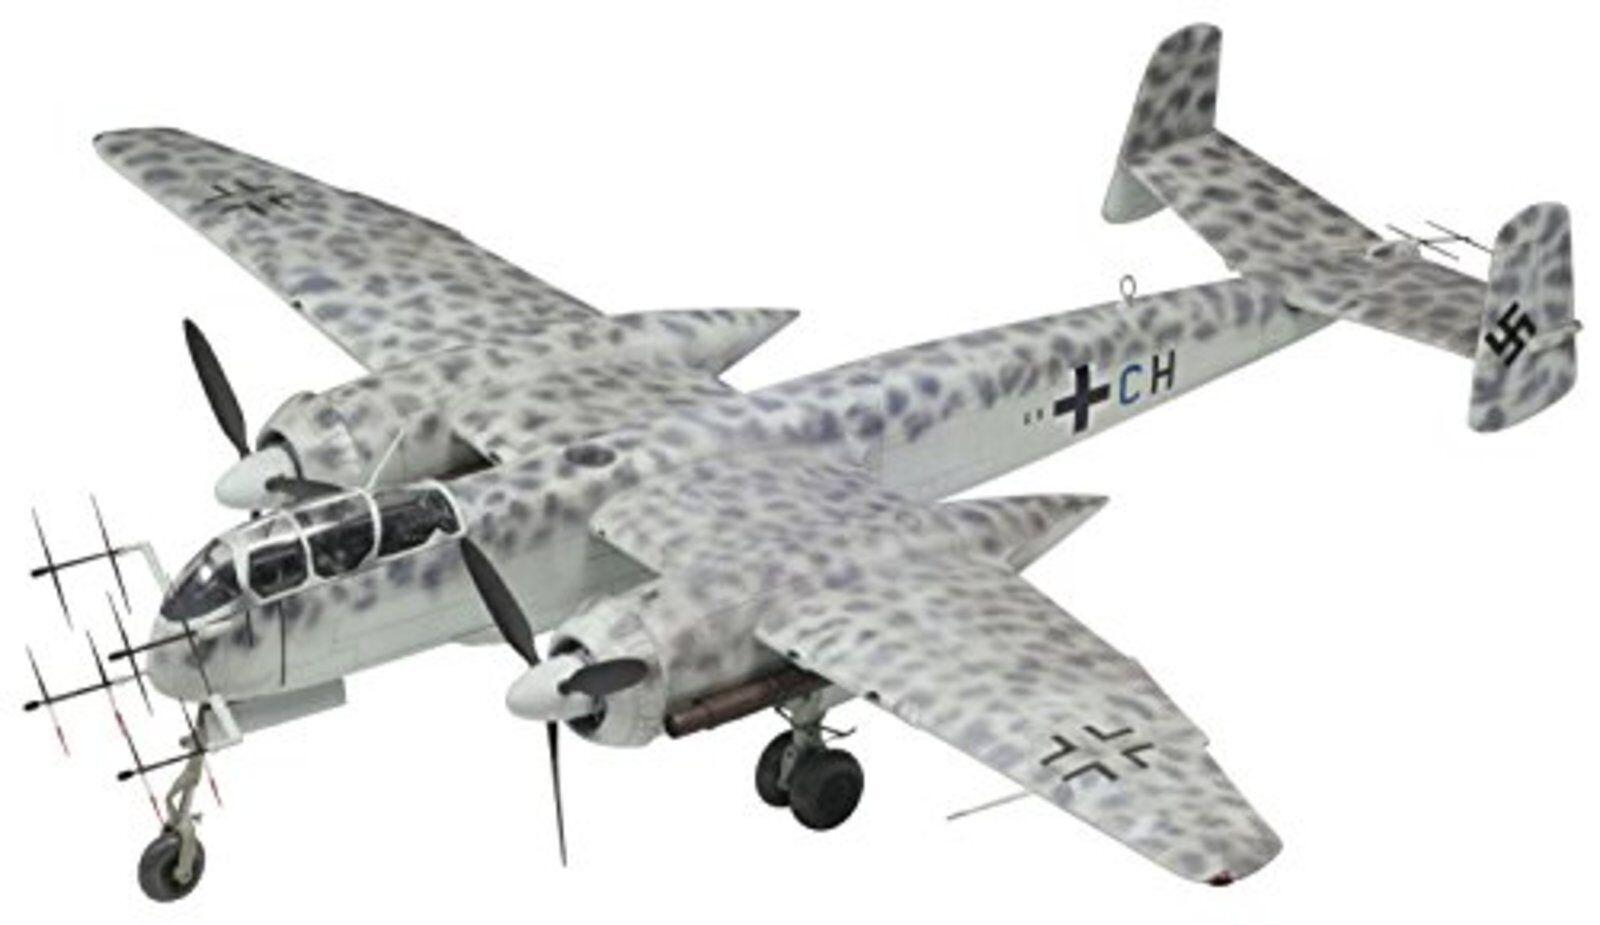 Platz 1 72 He219A-7 Uhu Plástico Modelo AE-1 Envío Gratis W  Tracking Nuevo de